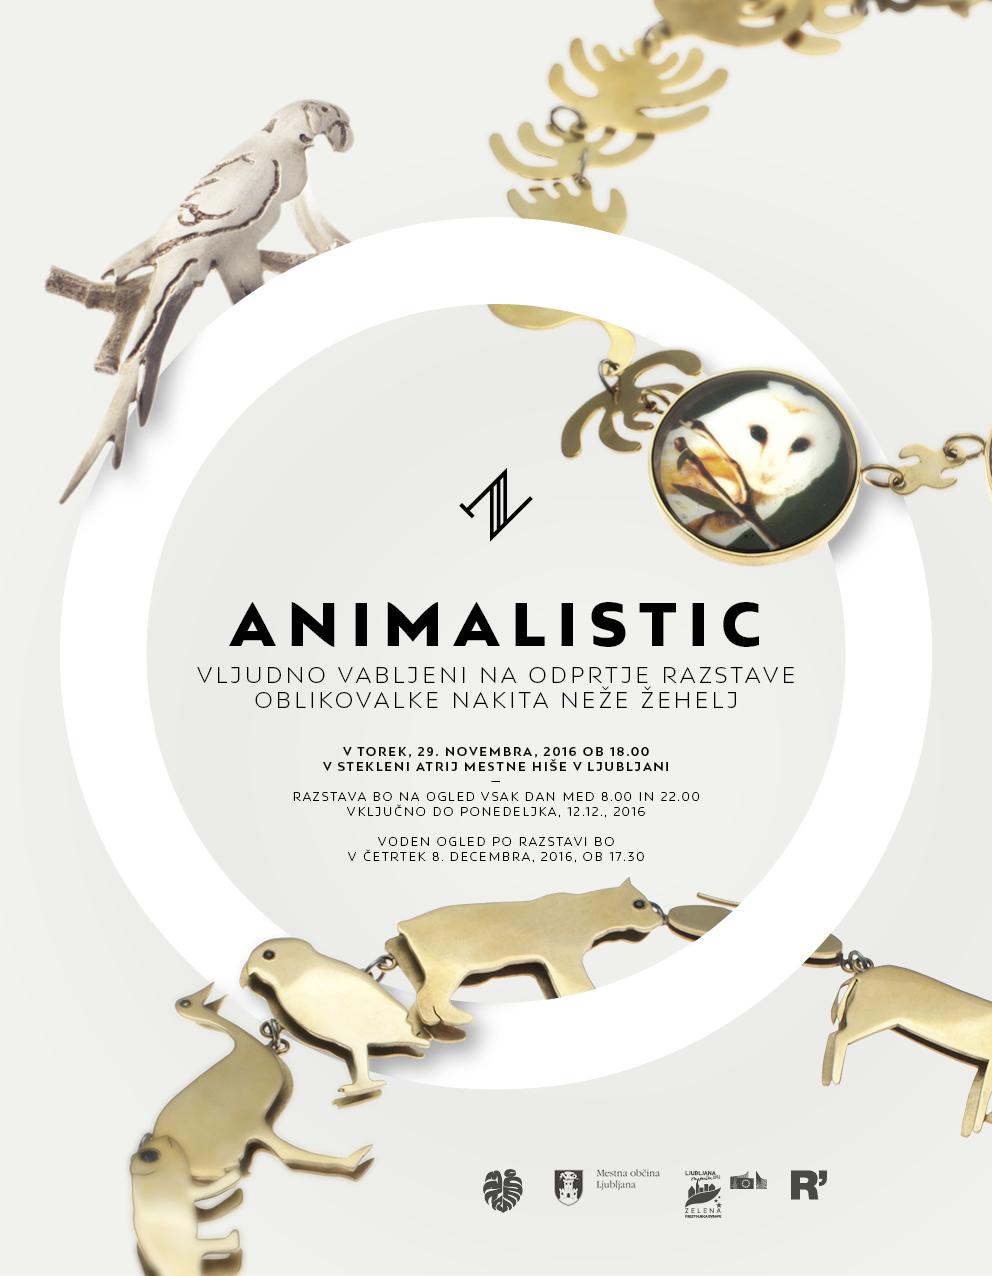 Animalistic - Solo exhibition show /Ljubljana's town hall gallery29. November - 12. December / Ljubljana / Slovenia